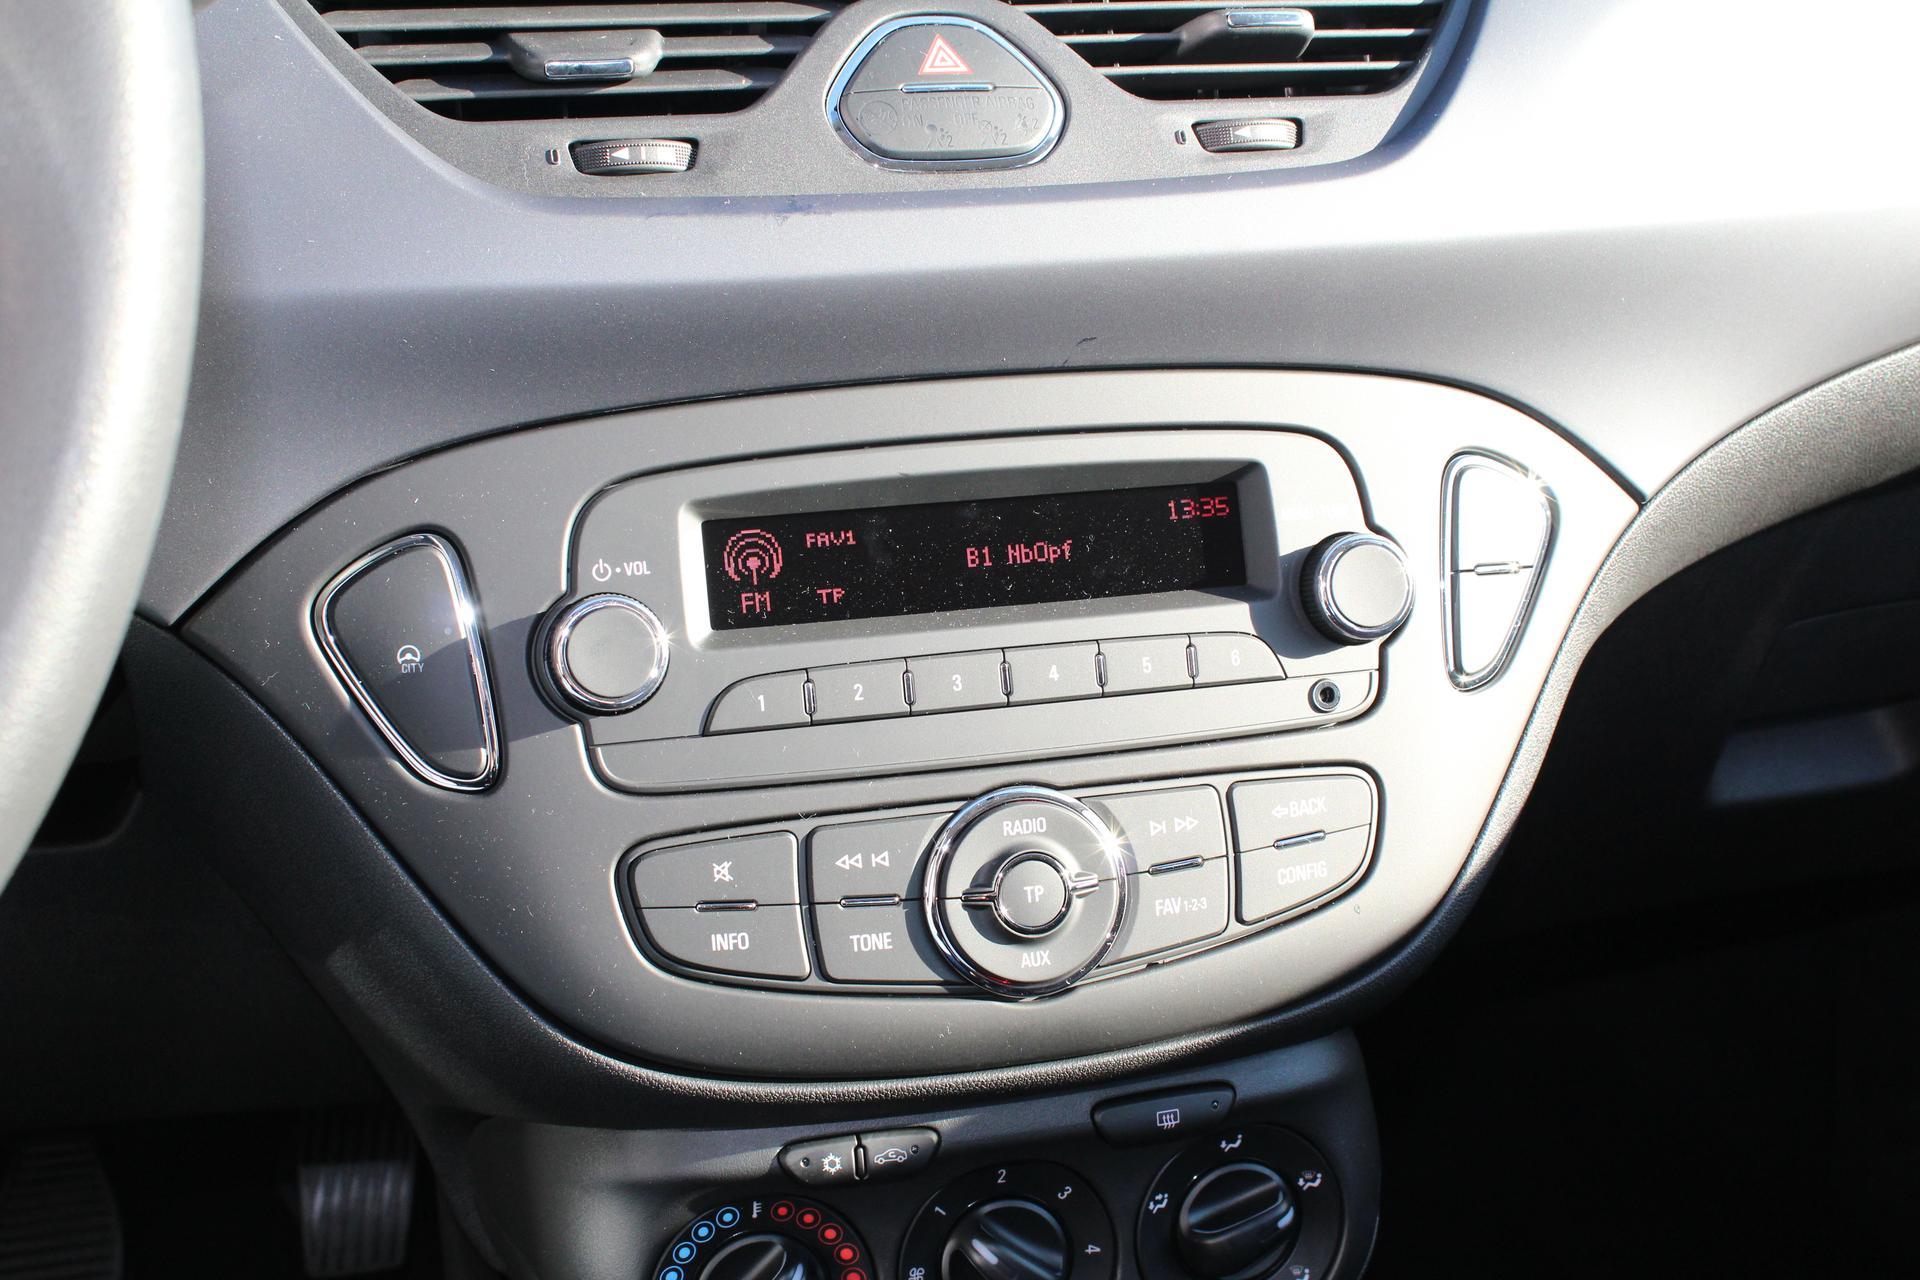 opel corsa 1.4 90 ps selection-klima-radio-top aktion sofort benzin